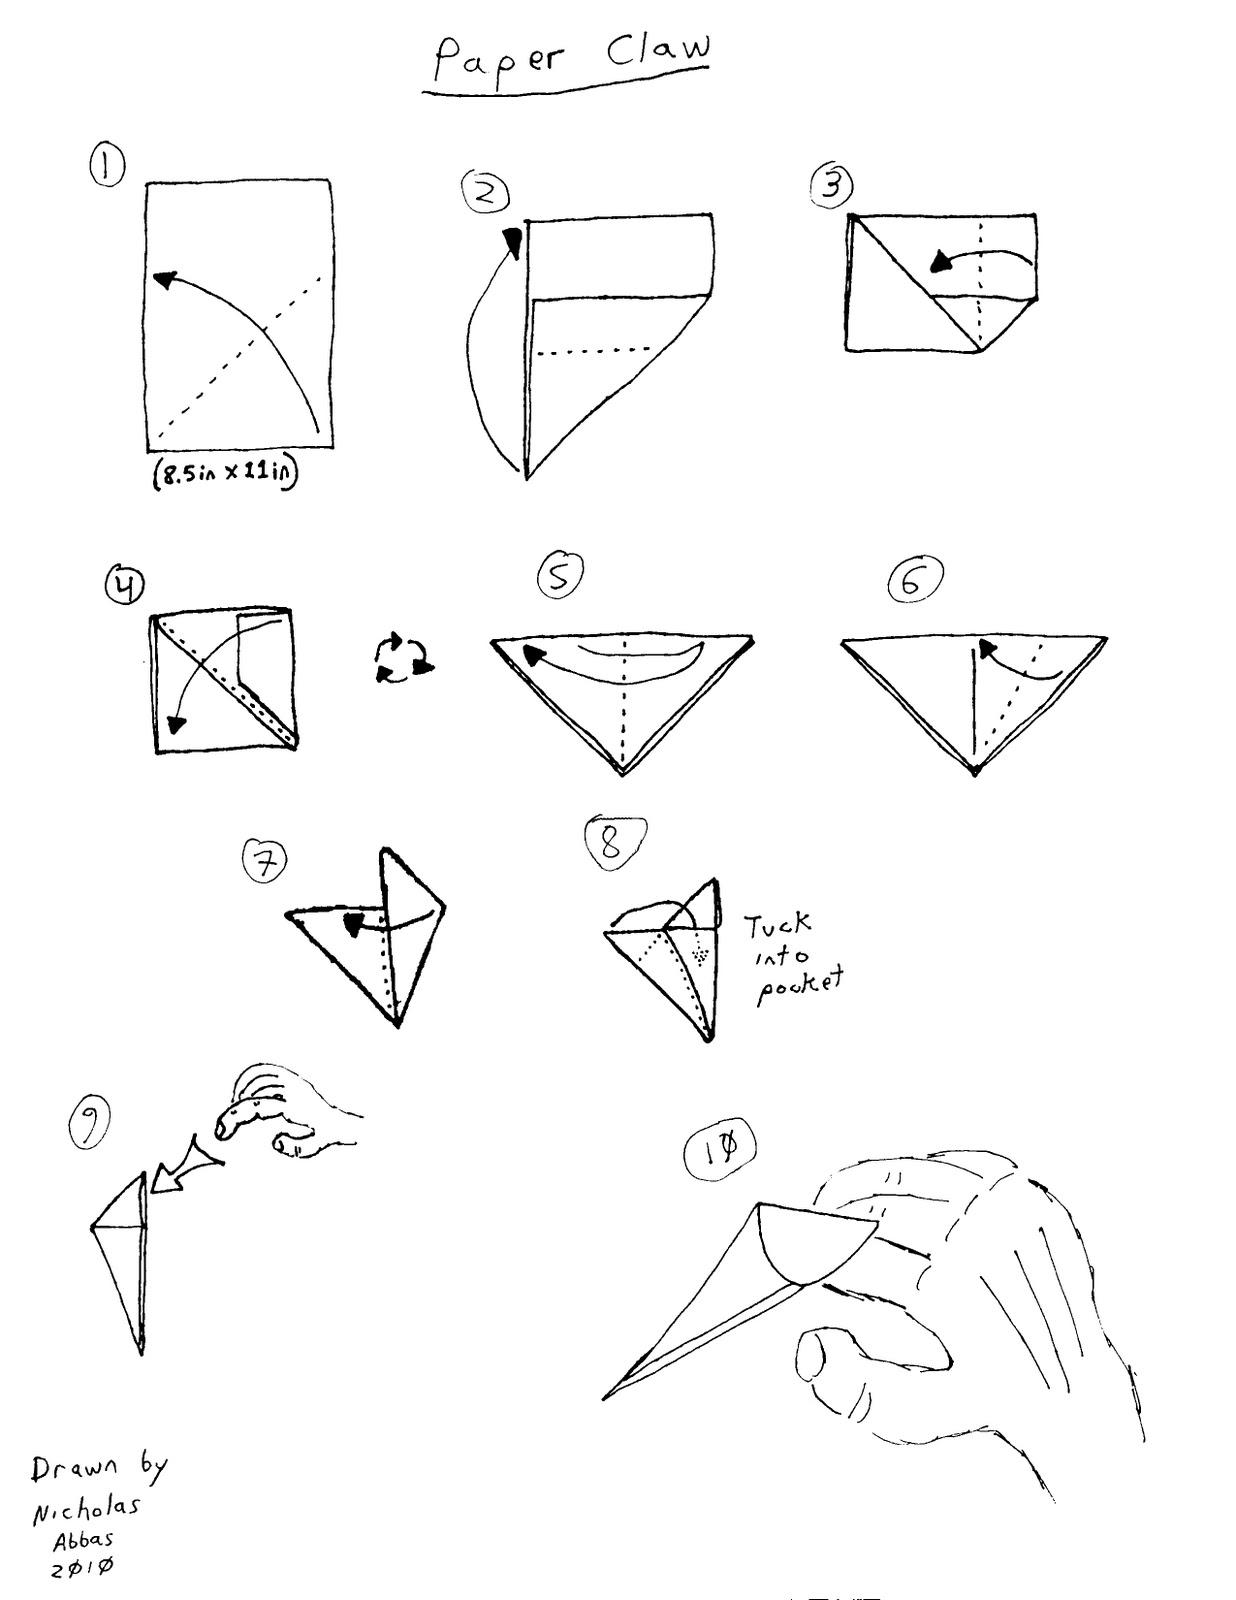 A Crisp Fold: 2010/09